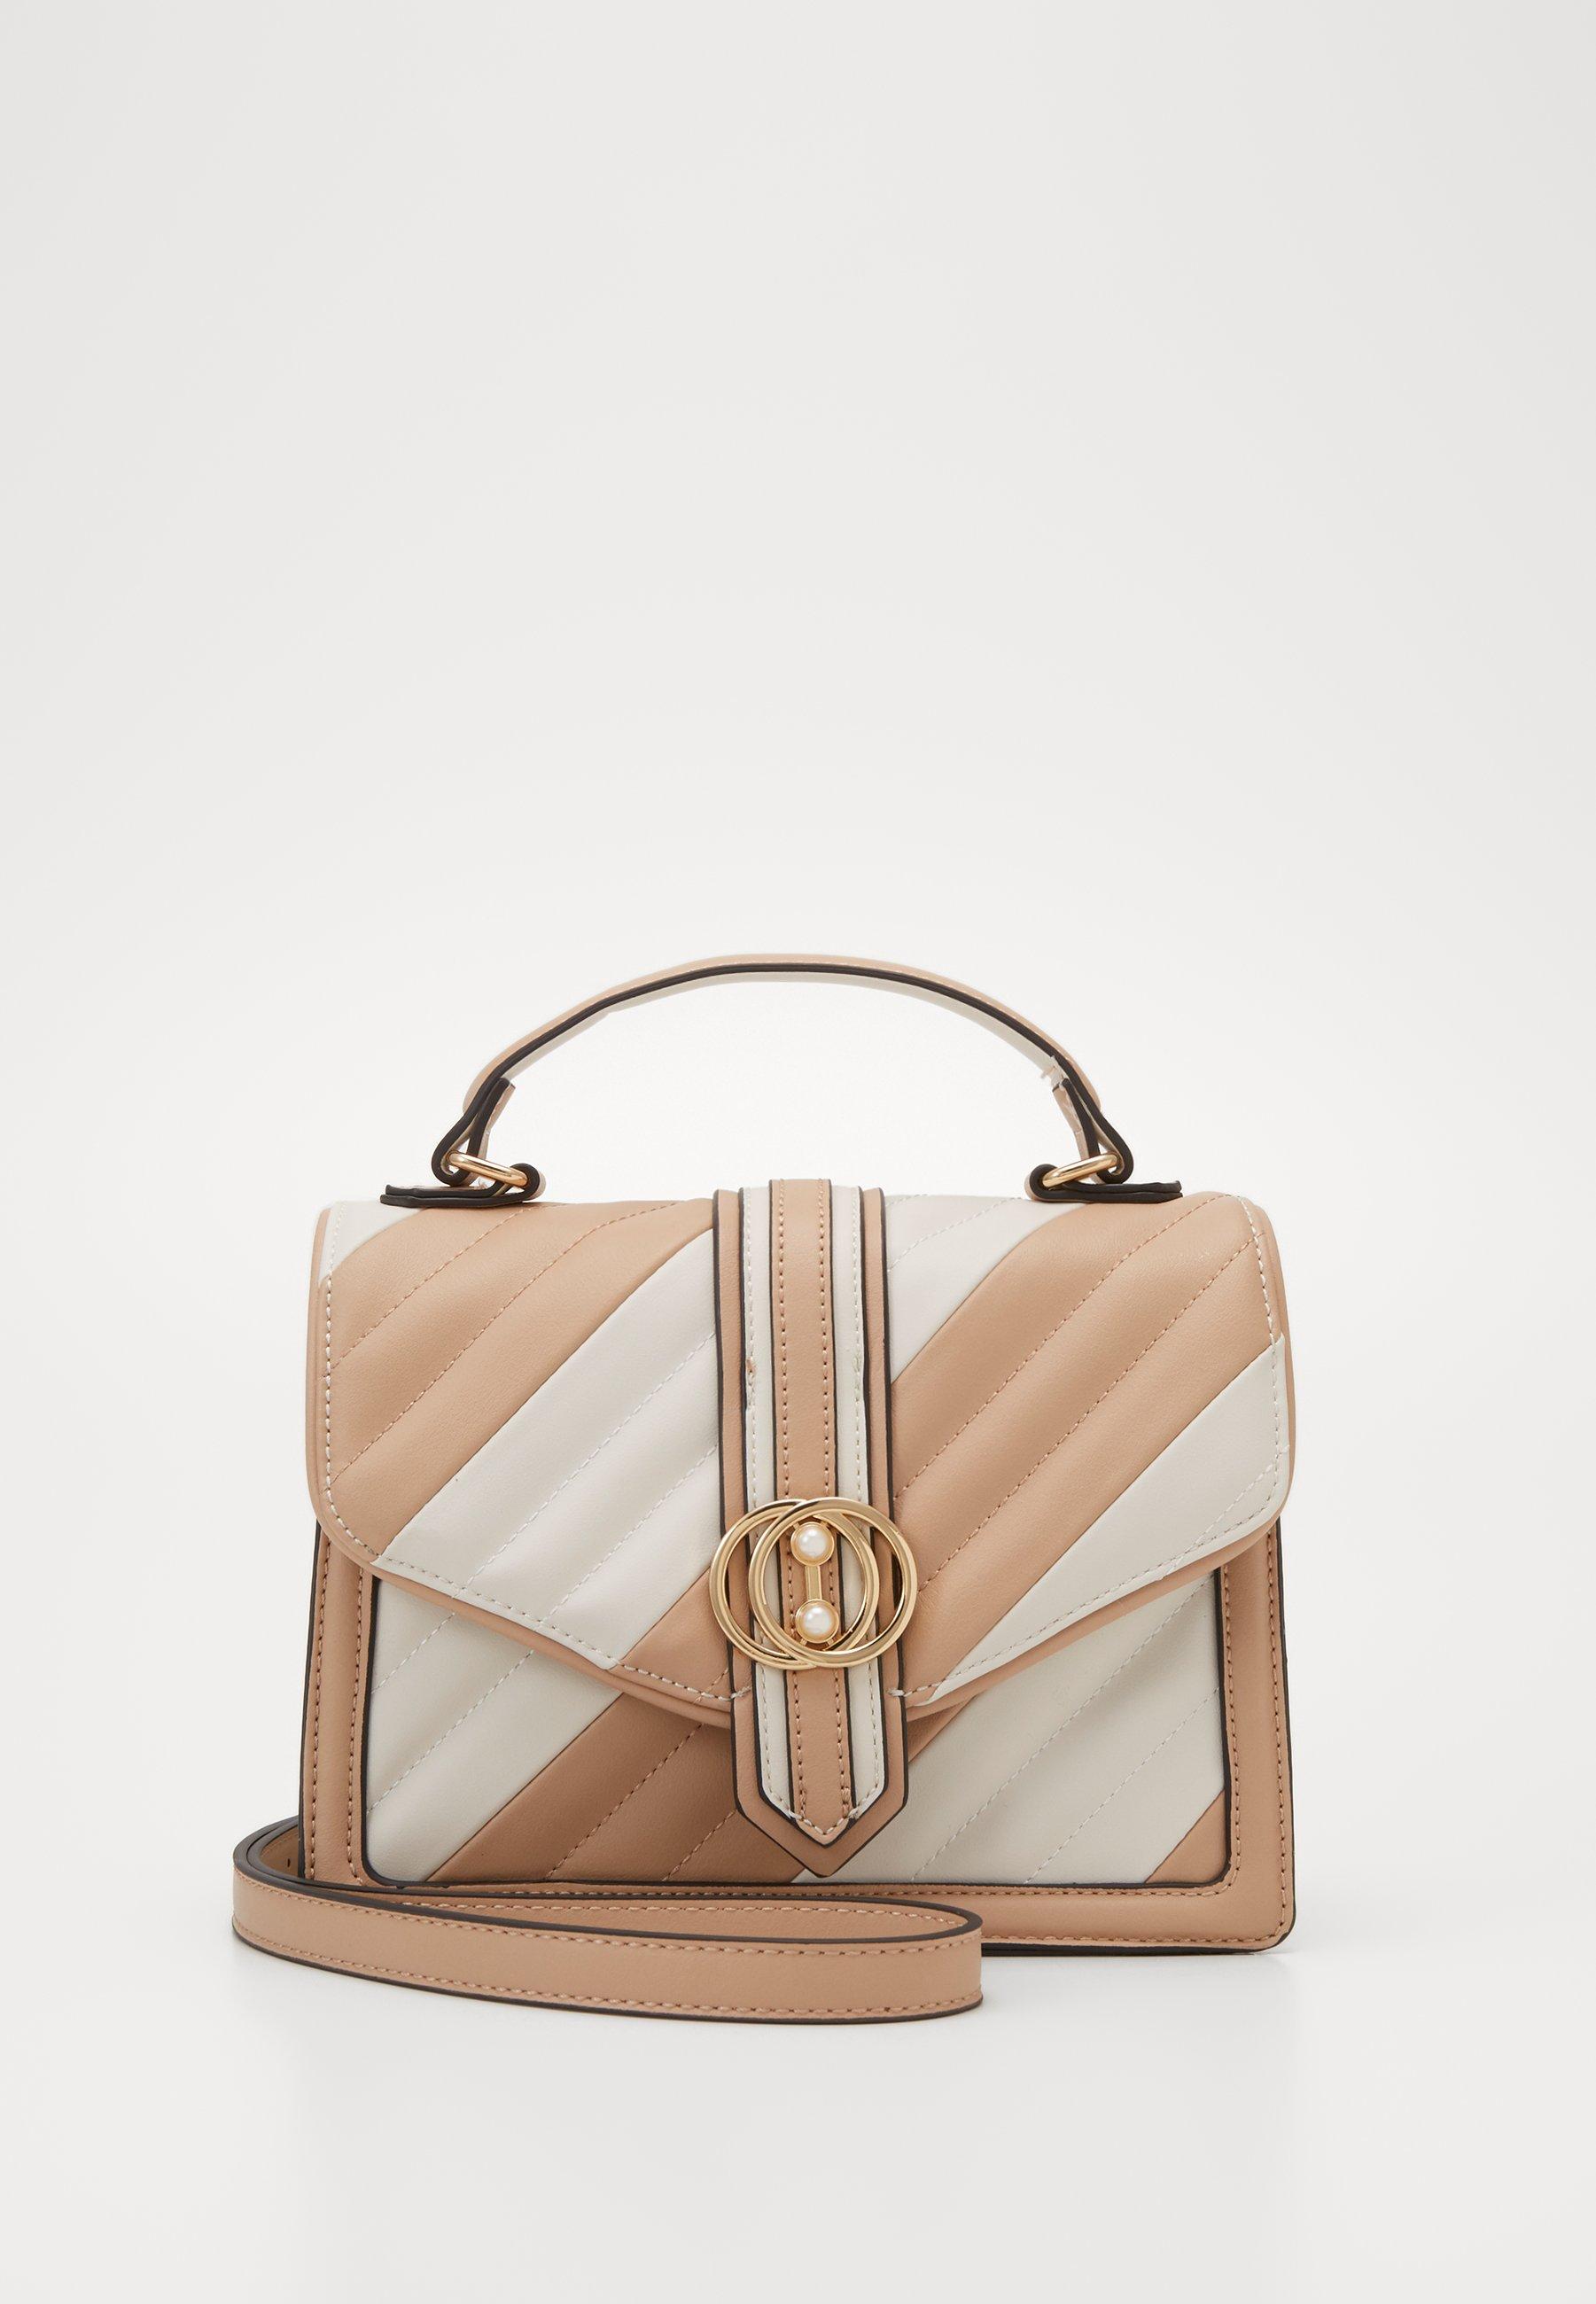 ALDO NENDADITH - Handbag - other beige - Women's Bags Best Place